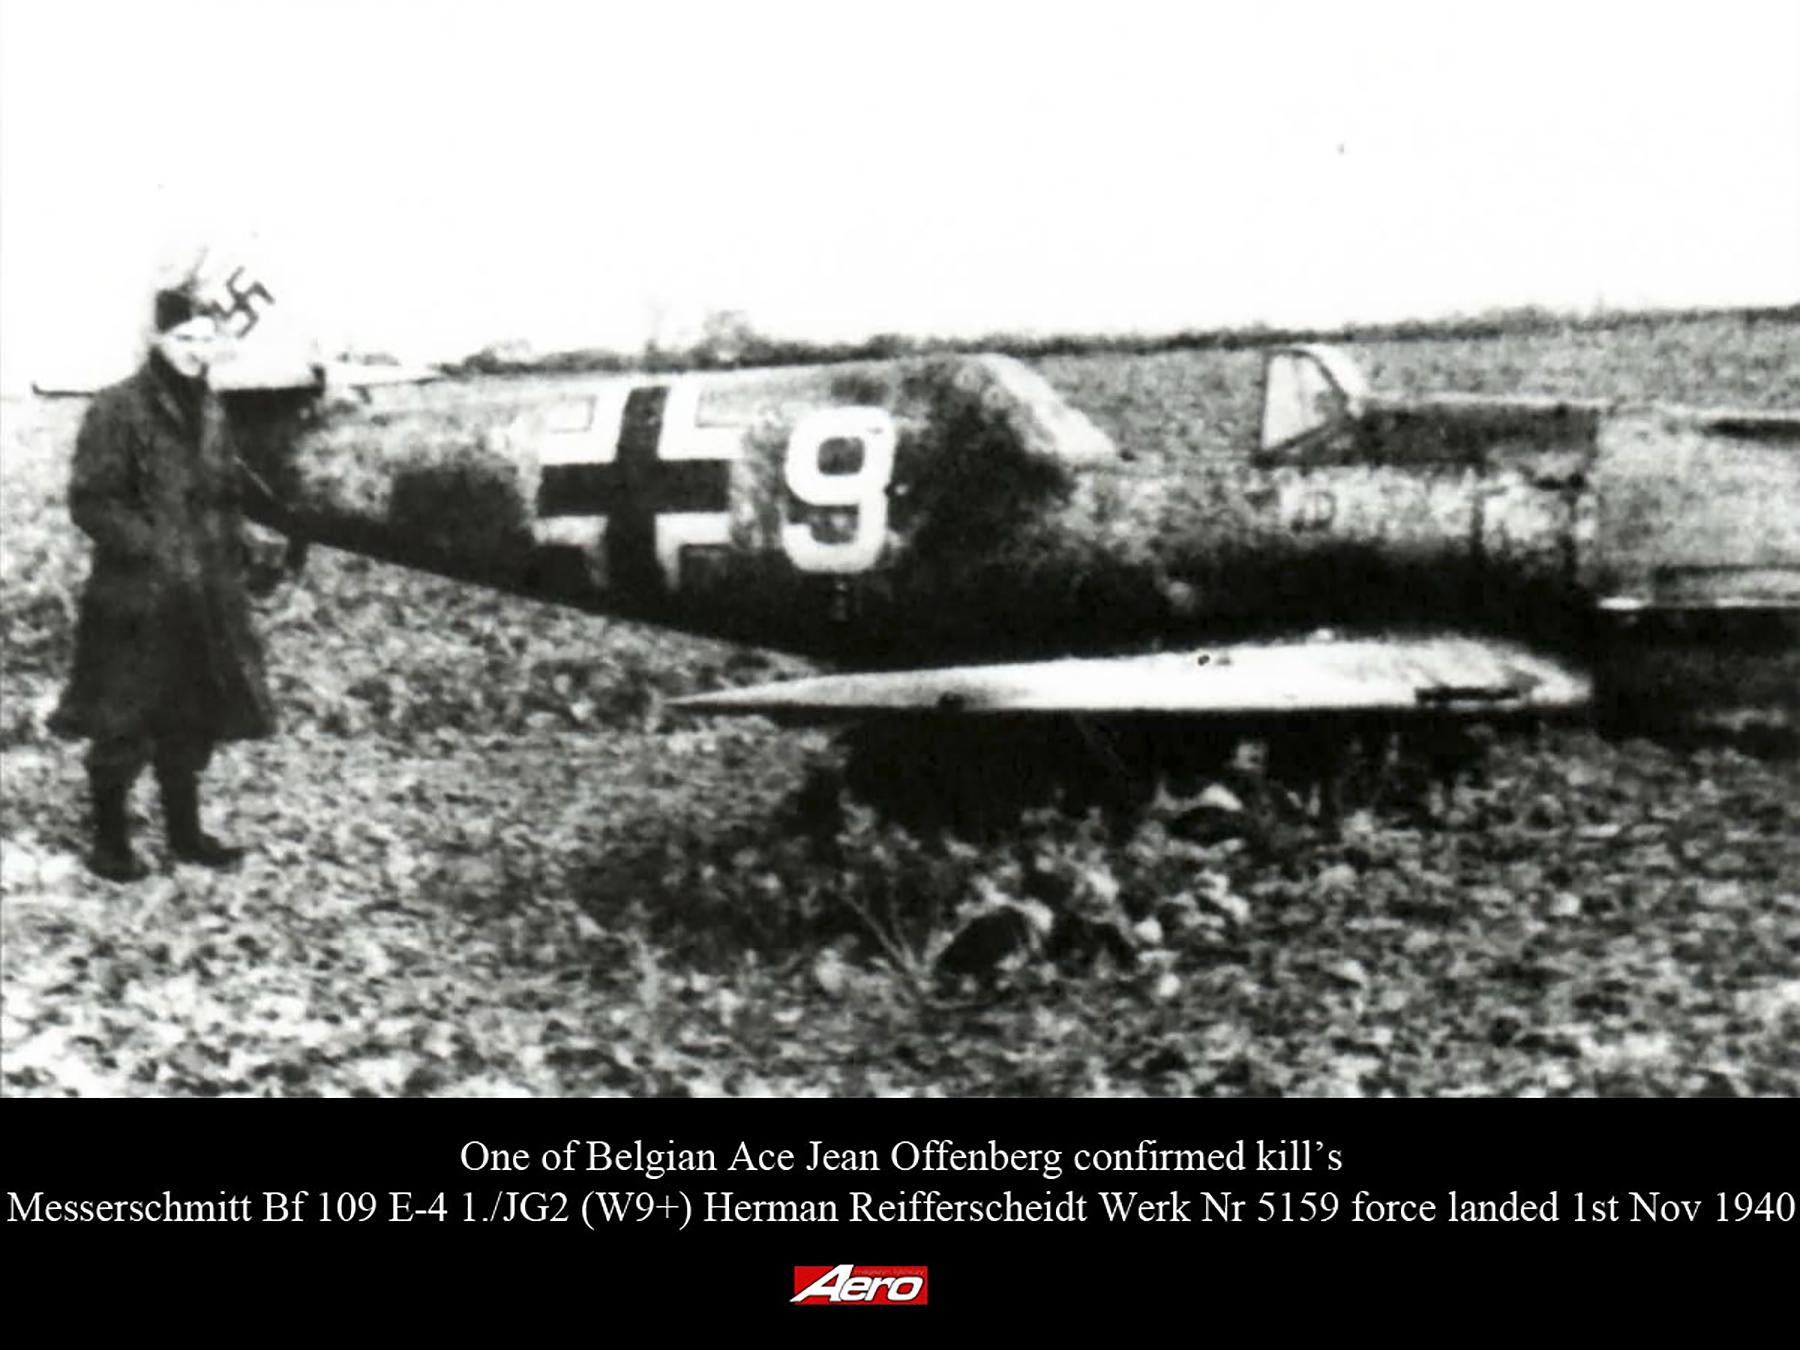 Downed Bf 109E4 1.JG2 (W9+) Herman Reifferscheidt Werk Nr 5159 force landed 1st Nov 1940